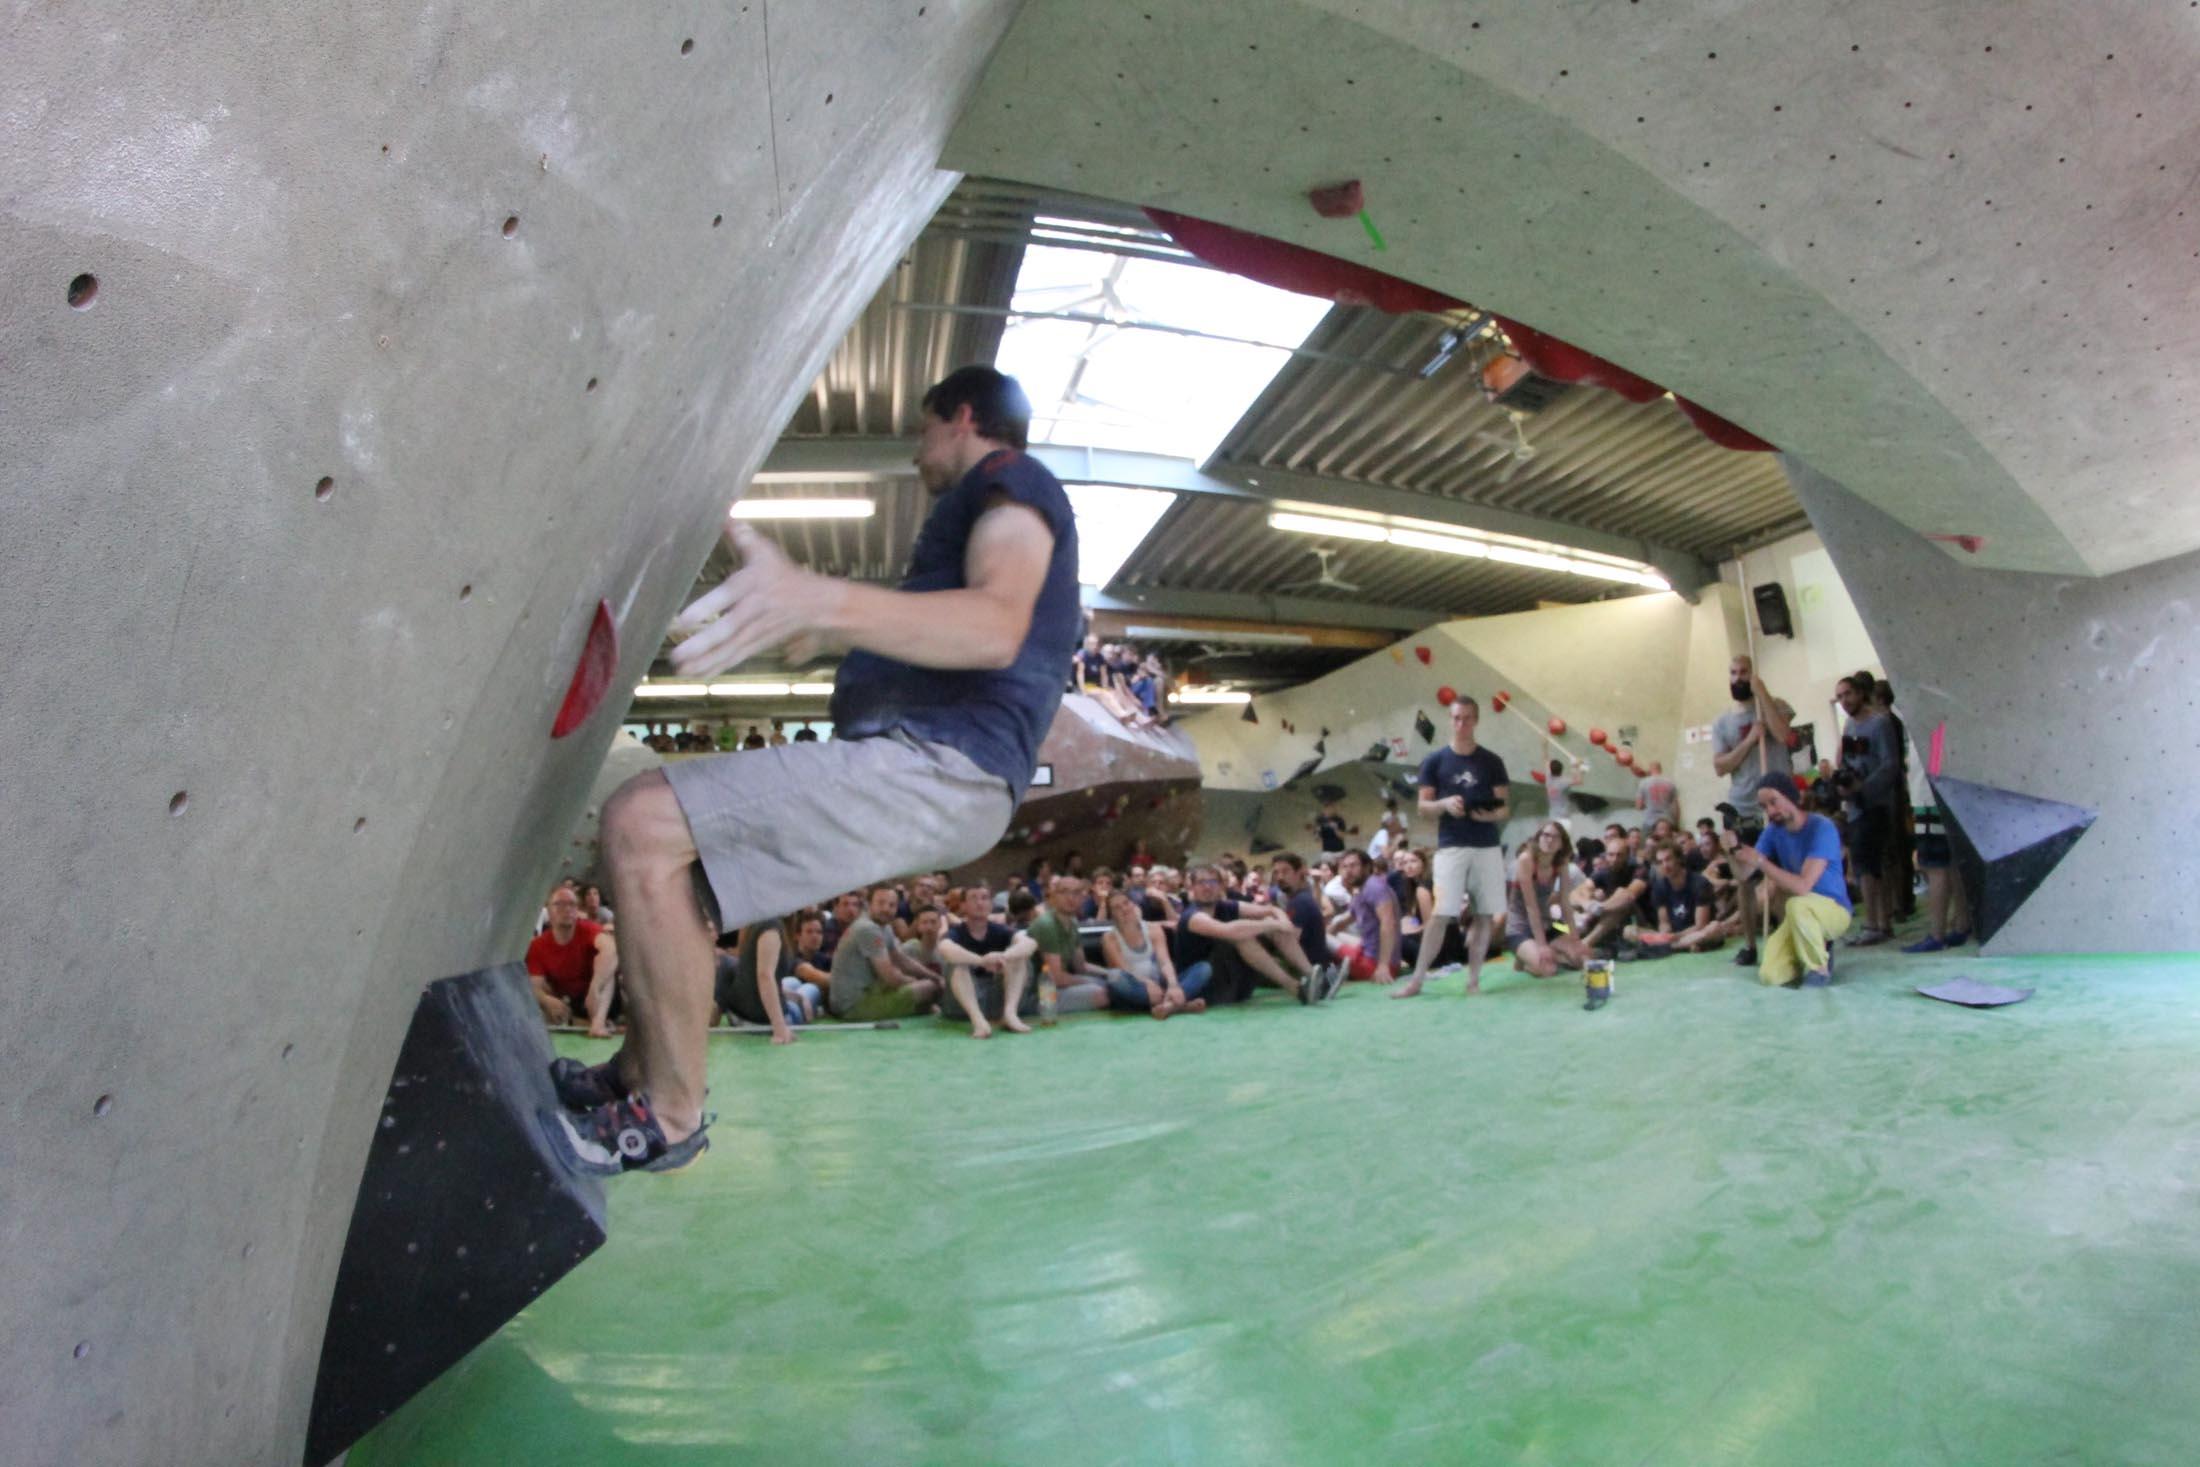 Finale, internationaler bouldercup Frankenjura 2016, BLOCKHELDEN Erlangen, Mammut, Bergfreunde.de, Boulderwettkampf07092016624